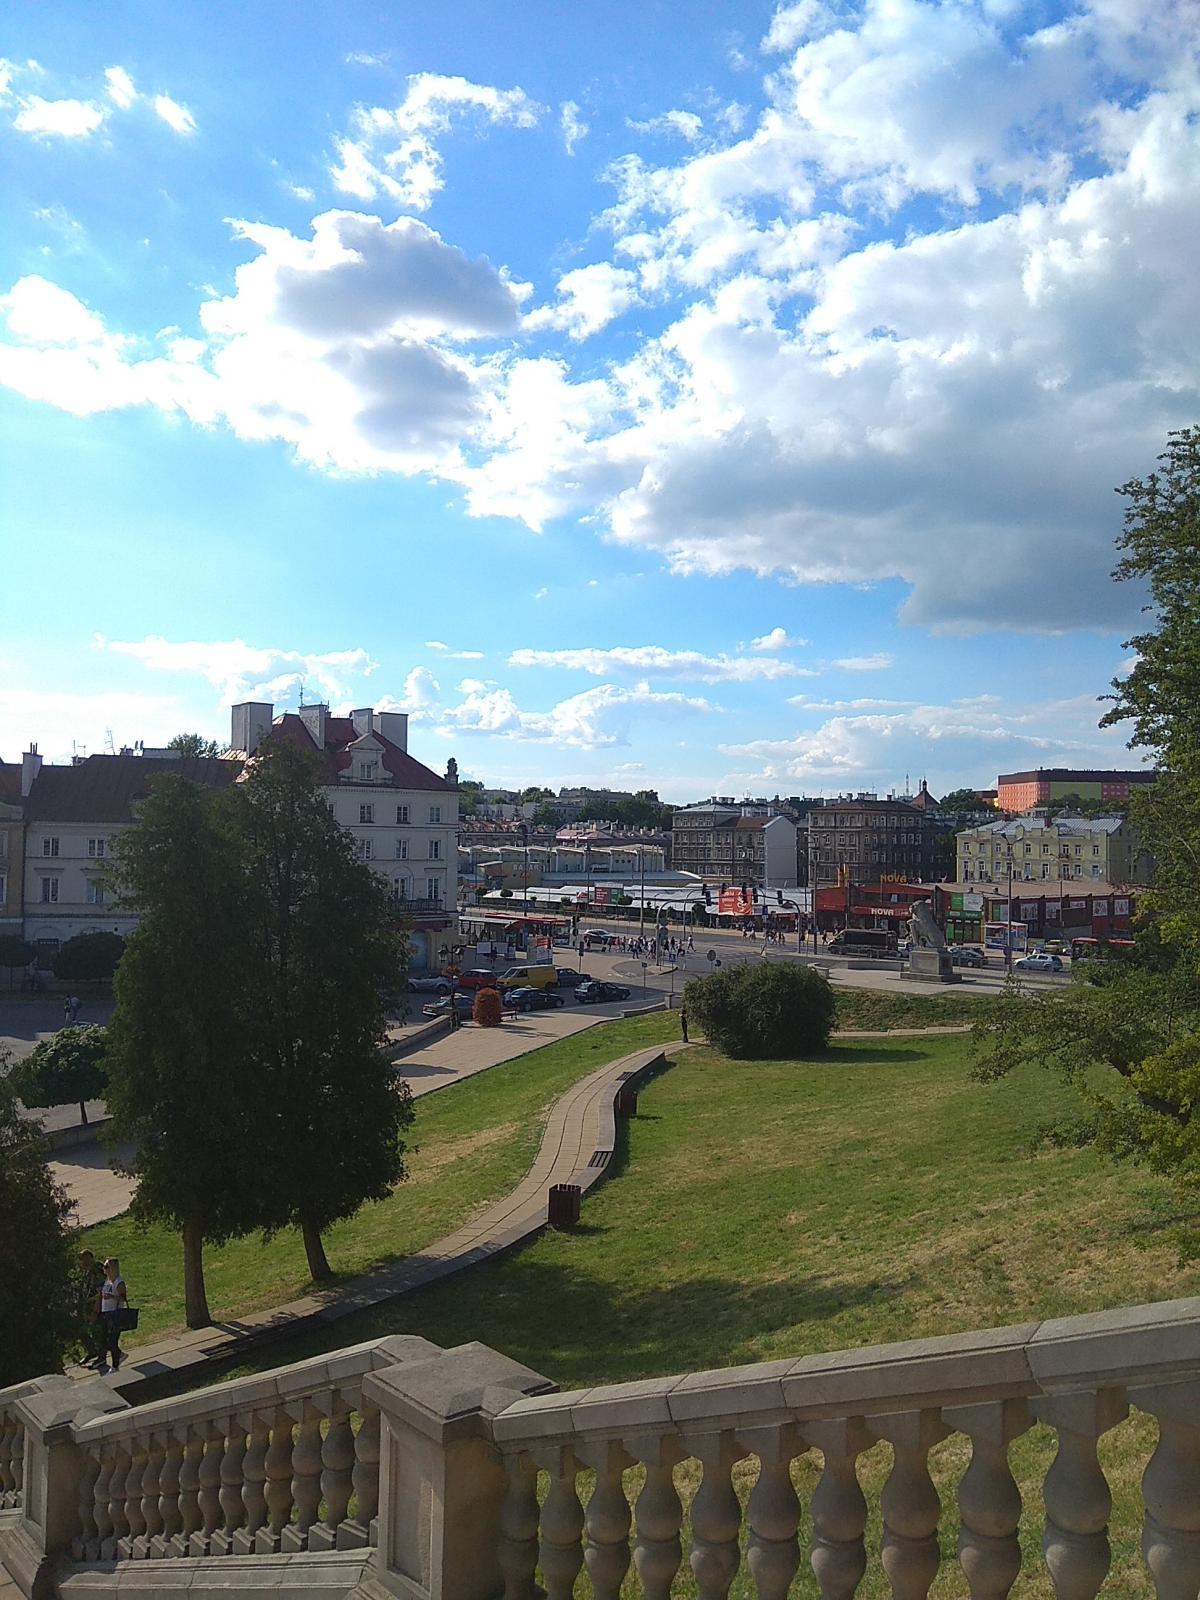 Замковая площадь, вид справа / фото Варвара Вайс